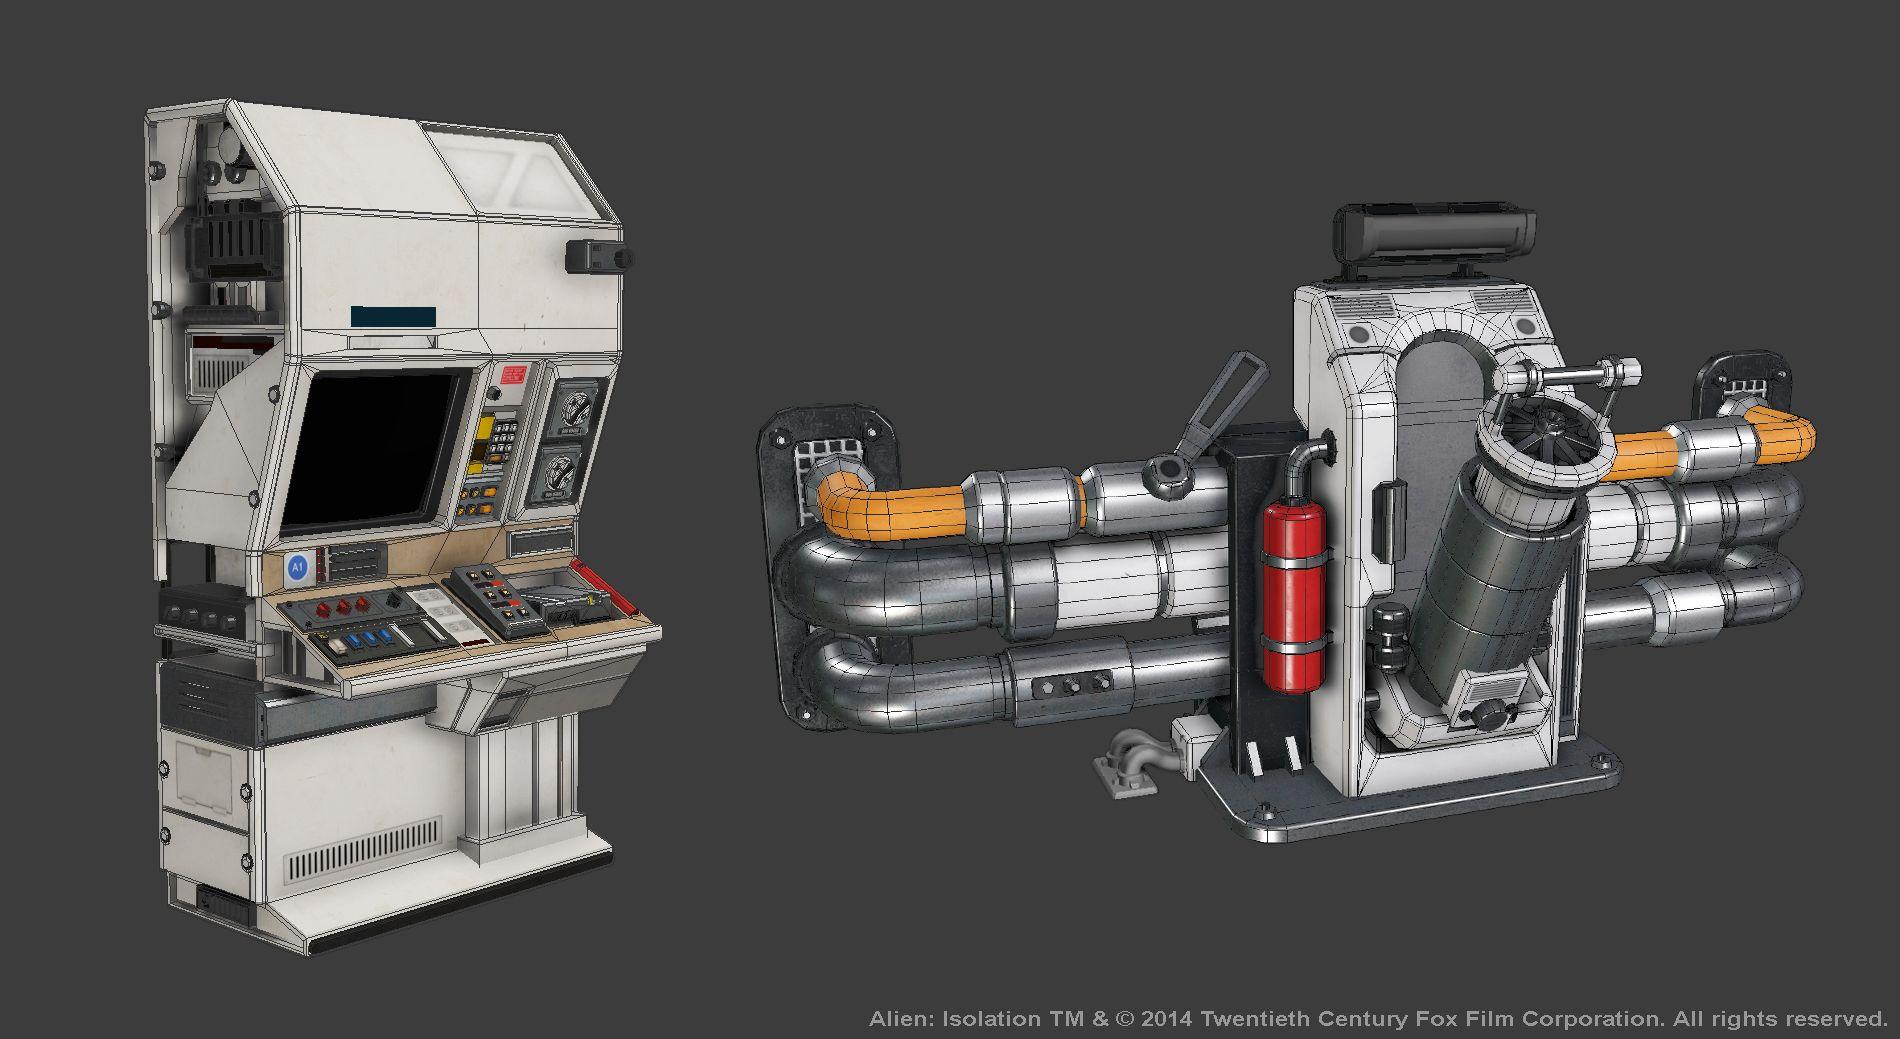 Alien Isolation Assets | 3D Props | Alien isolation, Sci fi